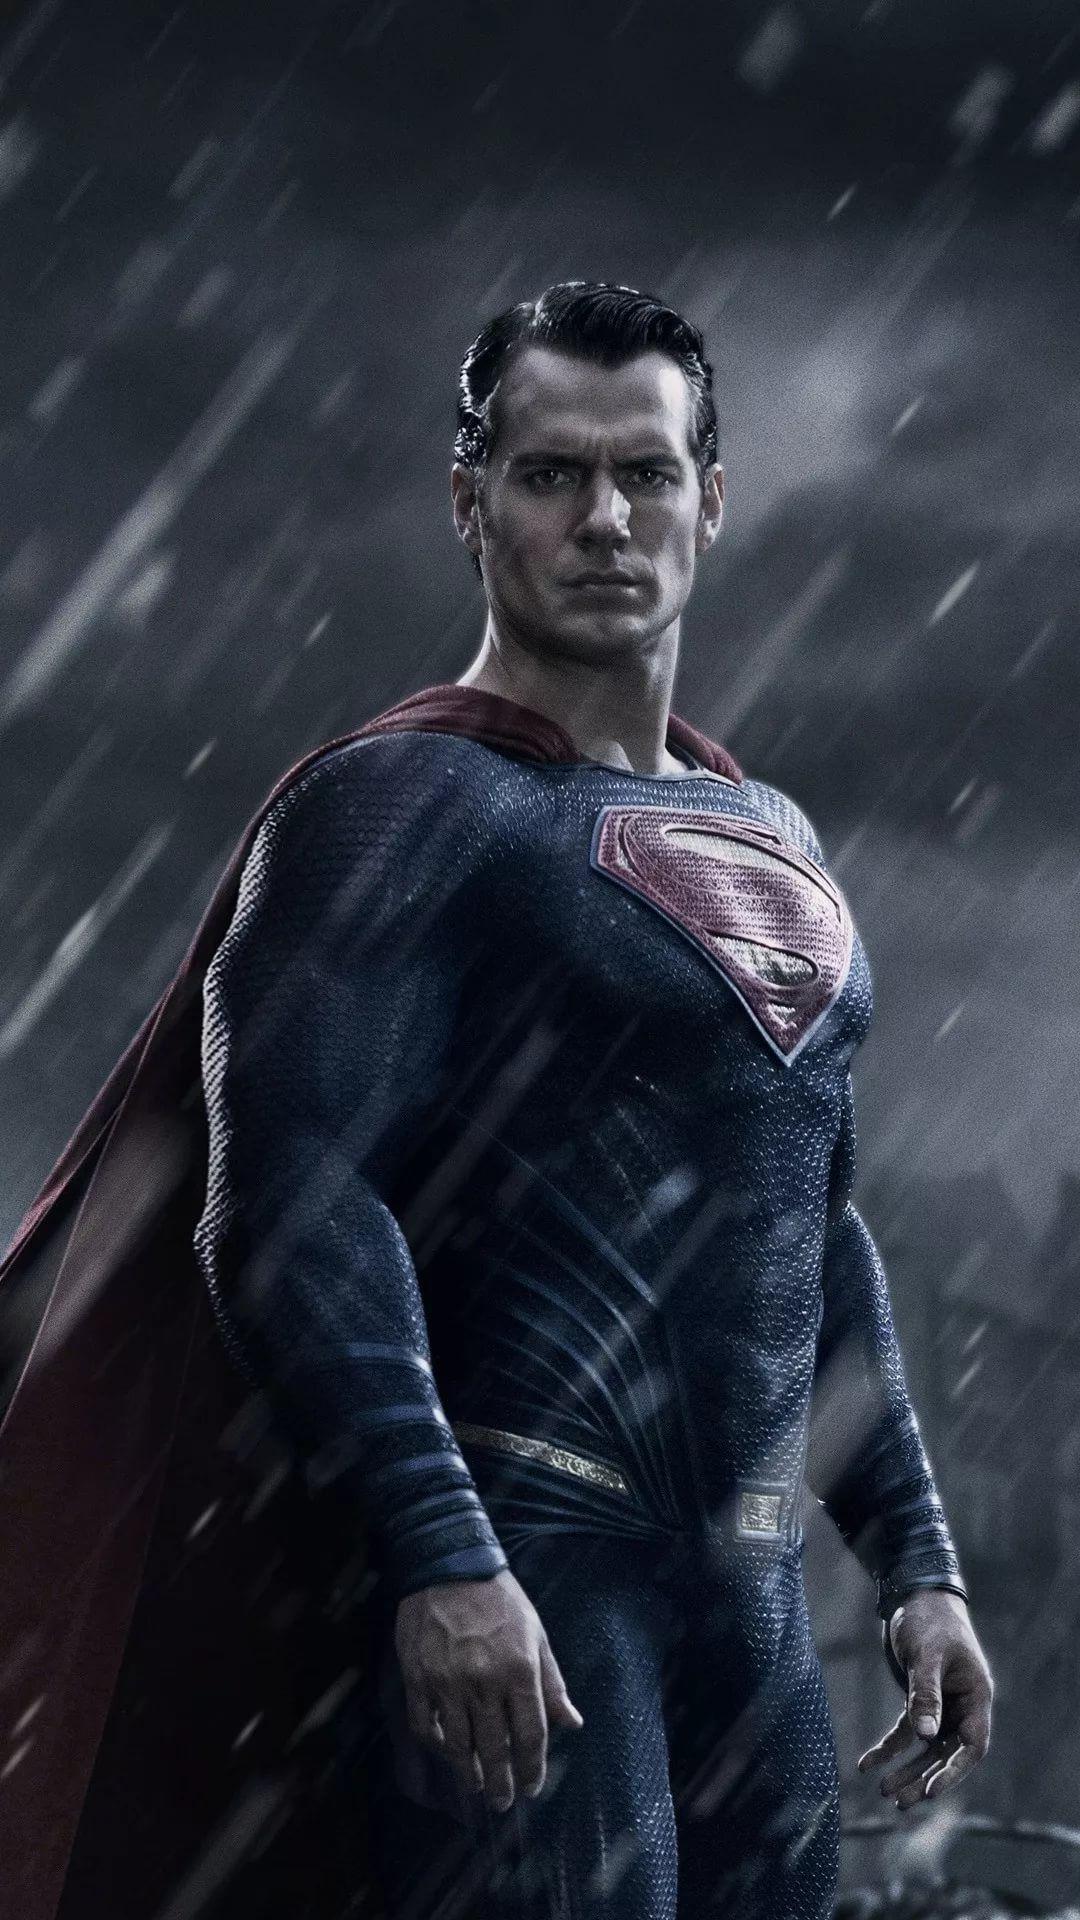 Superman Galaxy s7 wallpaper